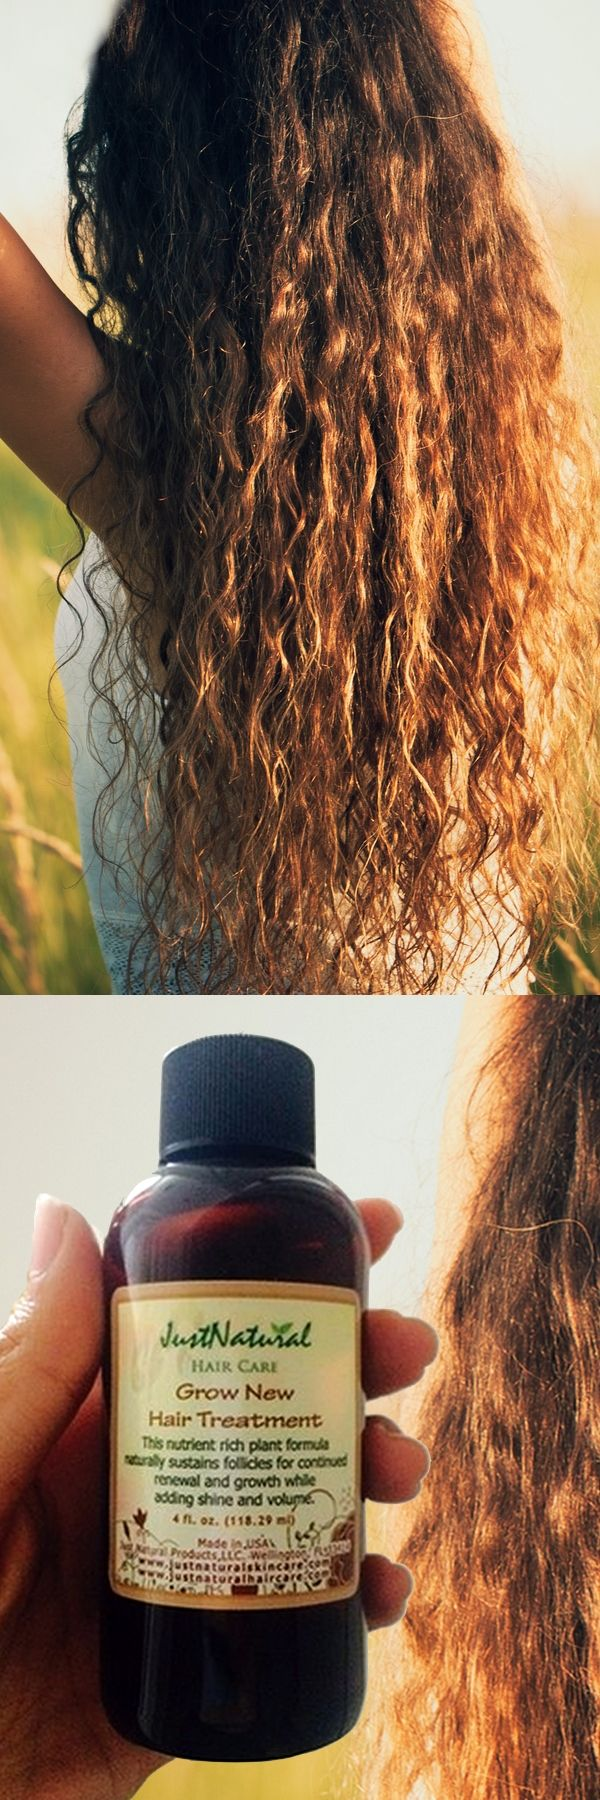 Grow New Hair Treatment Encourage Scalp To Grow New Hair to Grow Your Hair Faste...